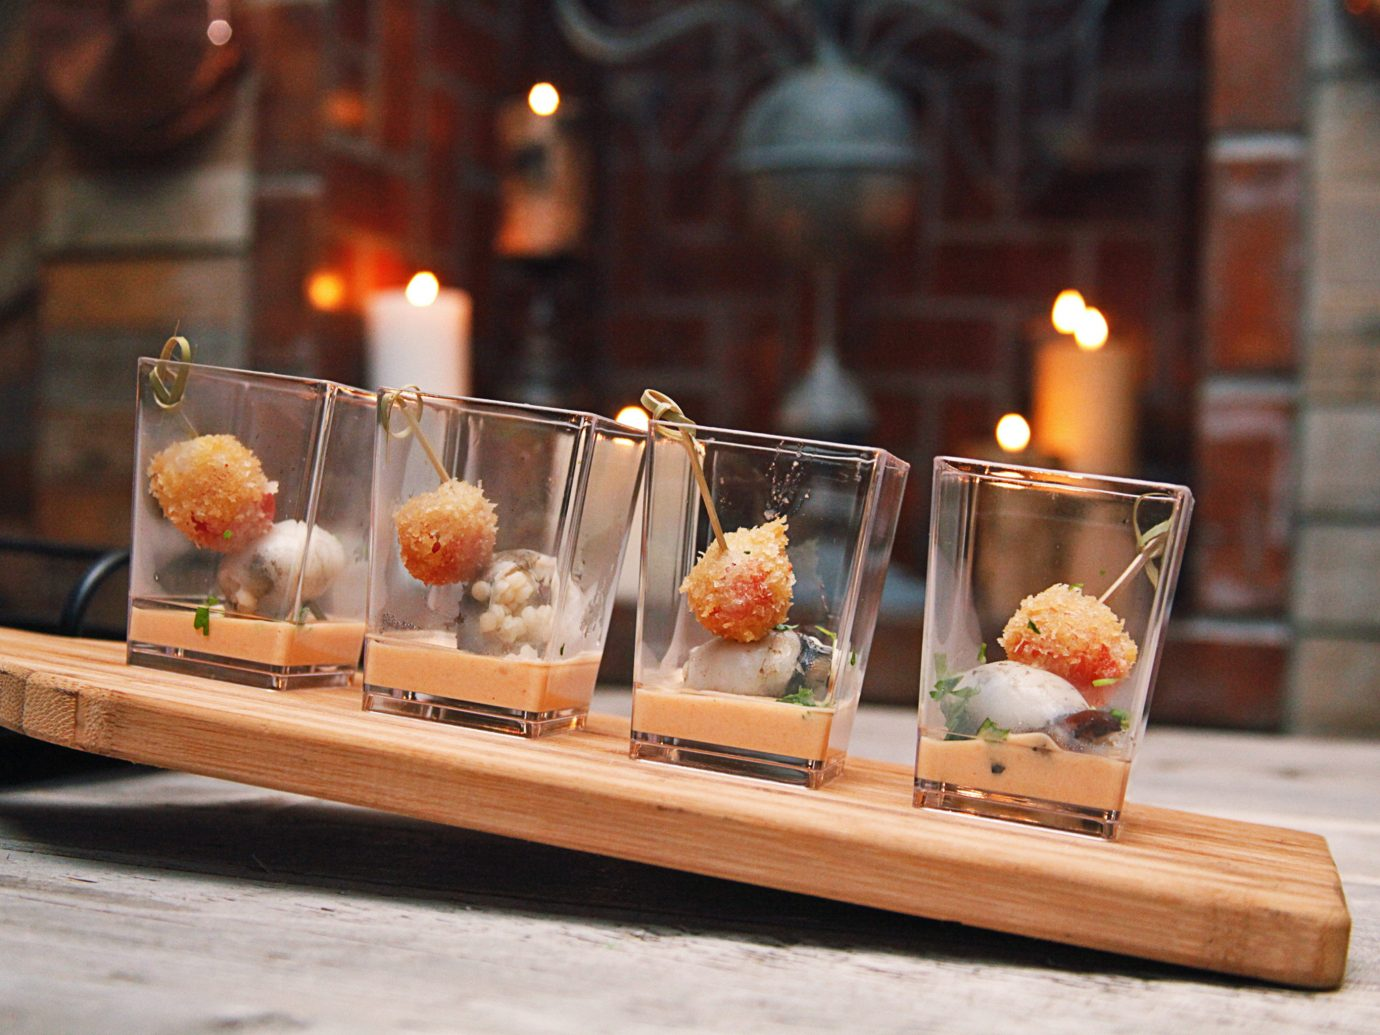 Bar Dining Drink Eat Hotels Luxury Modern table lighting wooden food meal restaurant